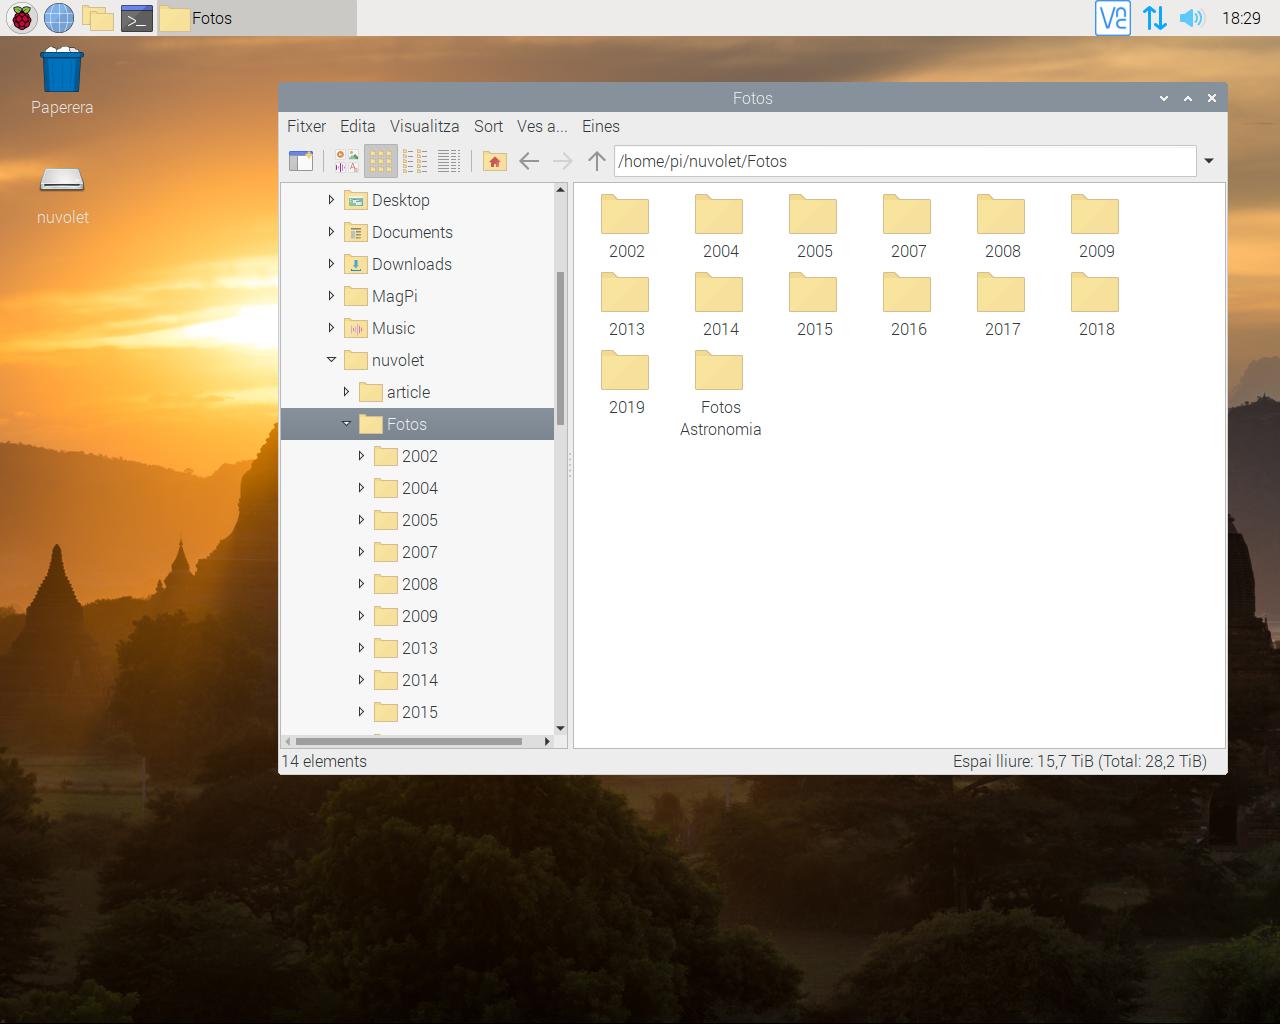 Muntant directoris remots d'una LAN a una Raspberry mitjançant sshfs